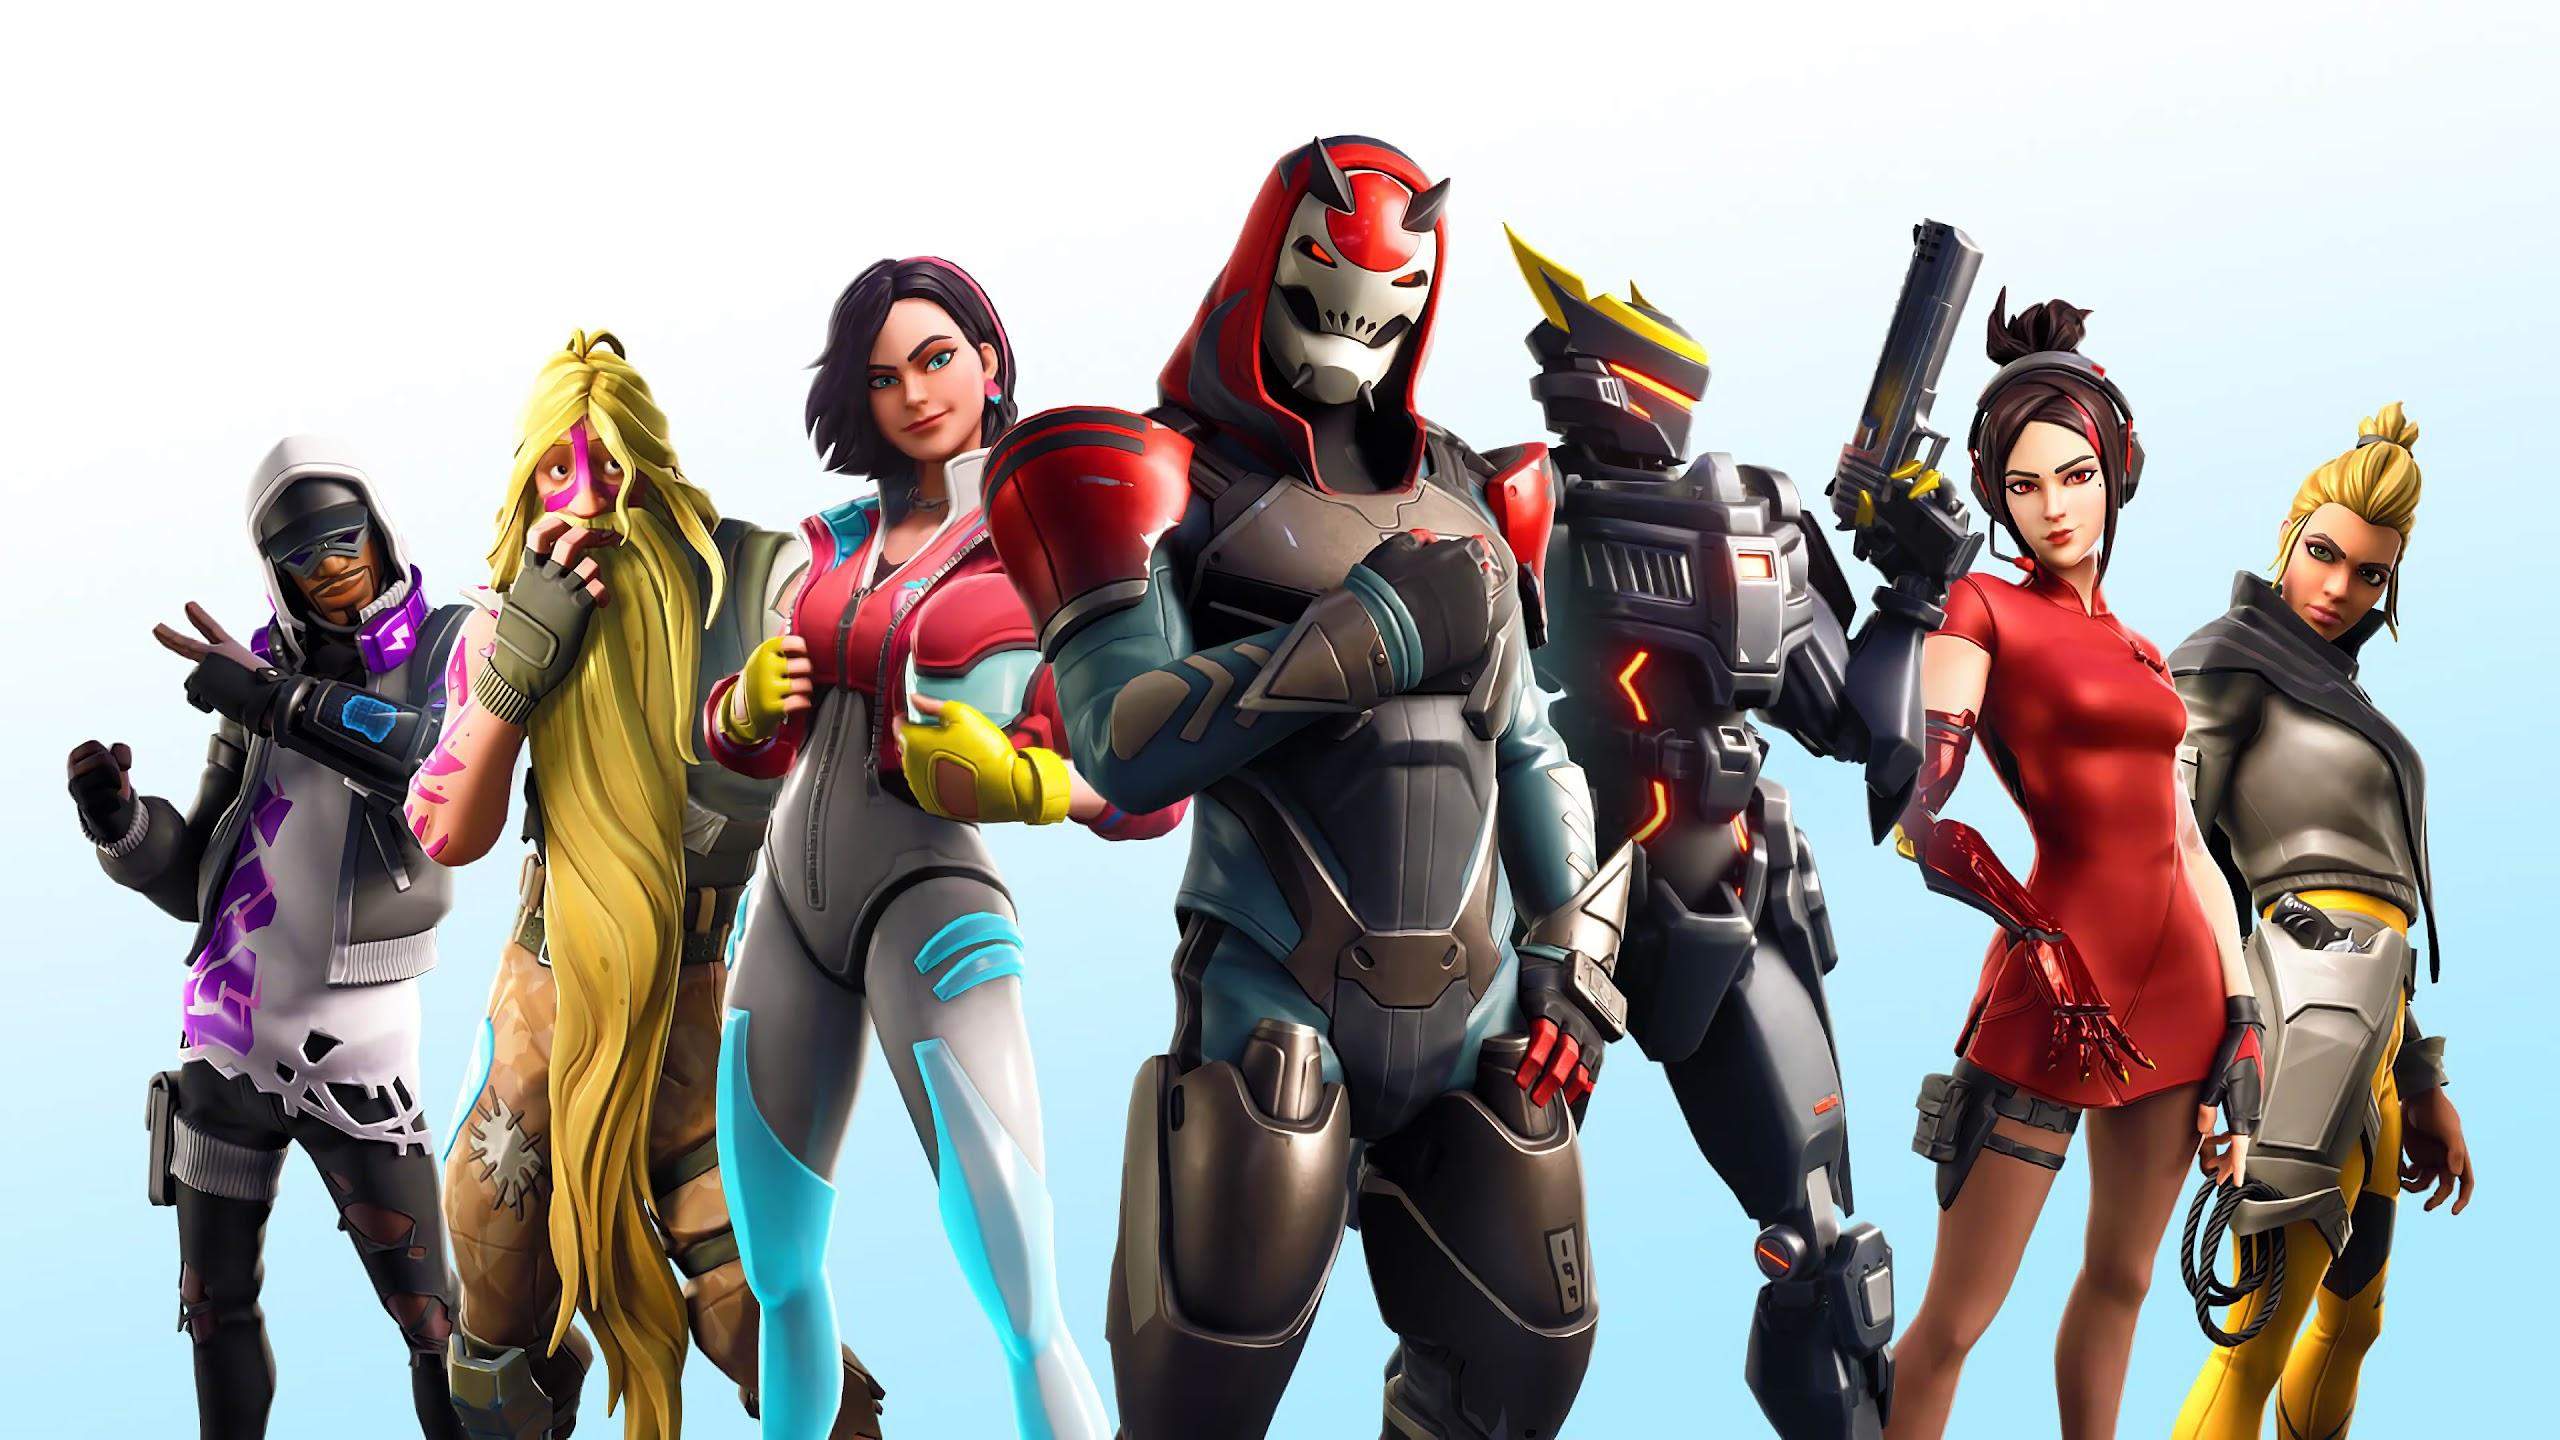 Fortnite Season 9 All Battle Pass Skins Outfits 4k Wallpaper